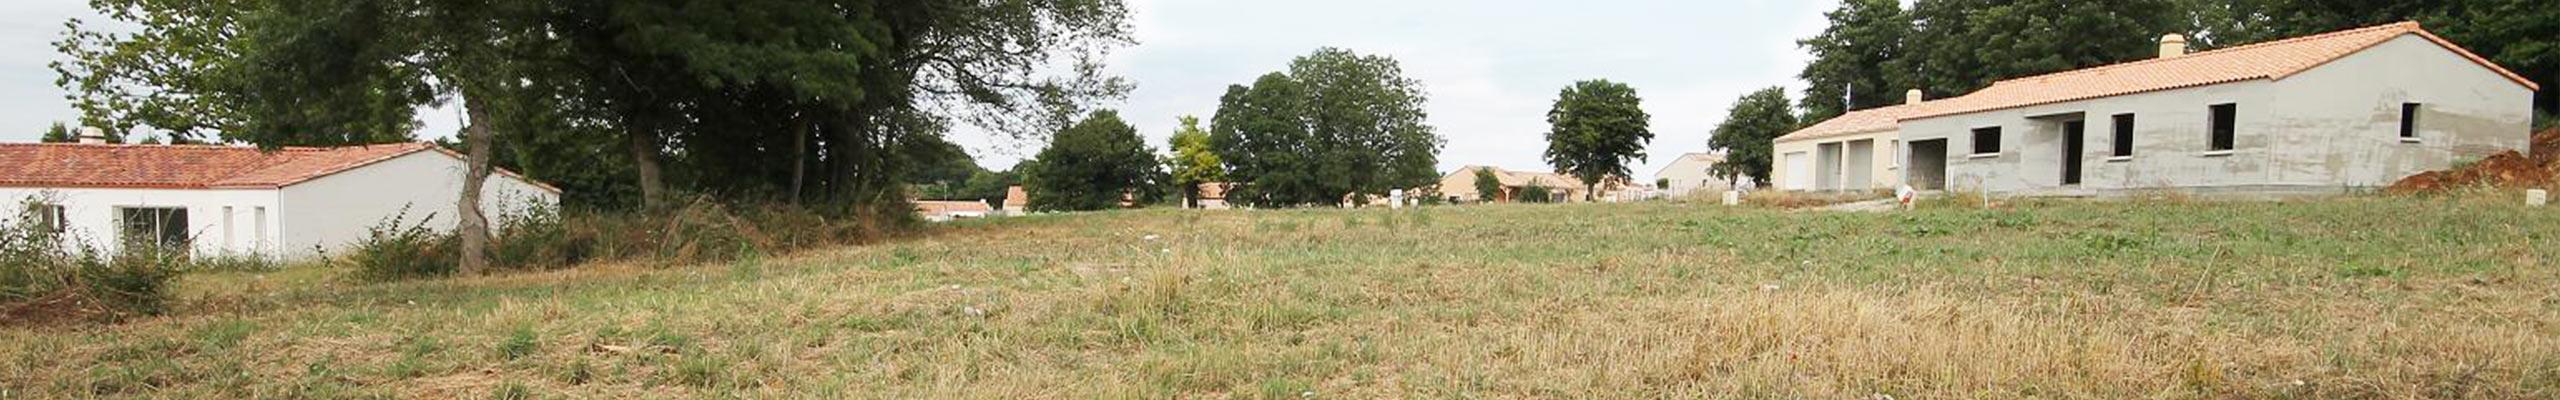 Terrain en vente Champ Saint Pere